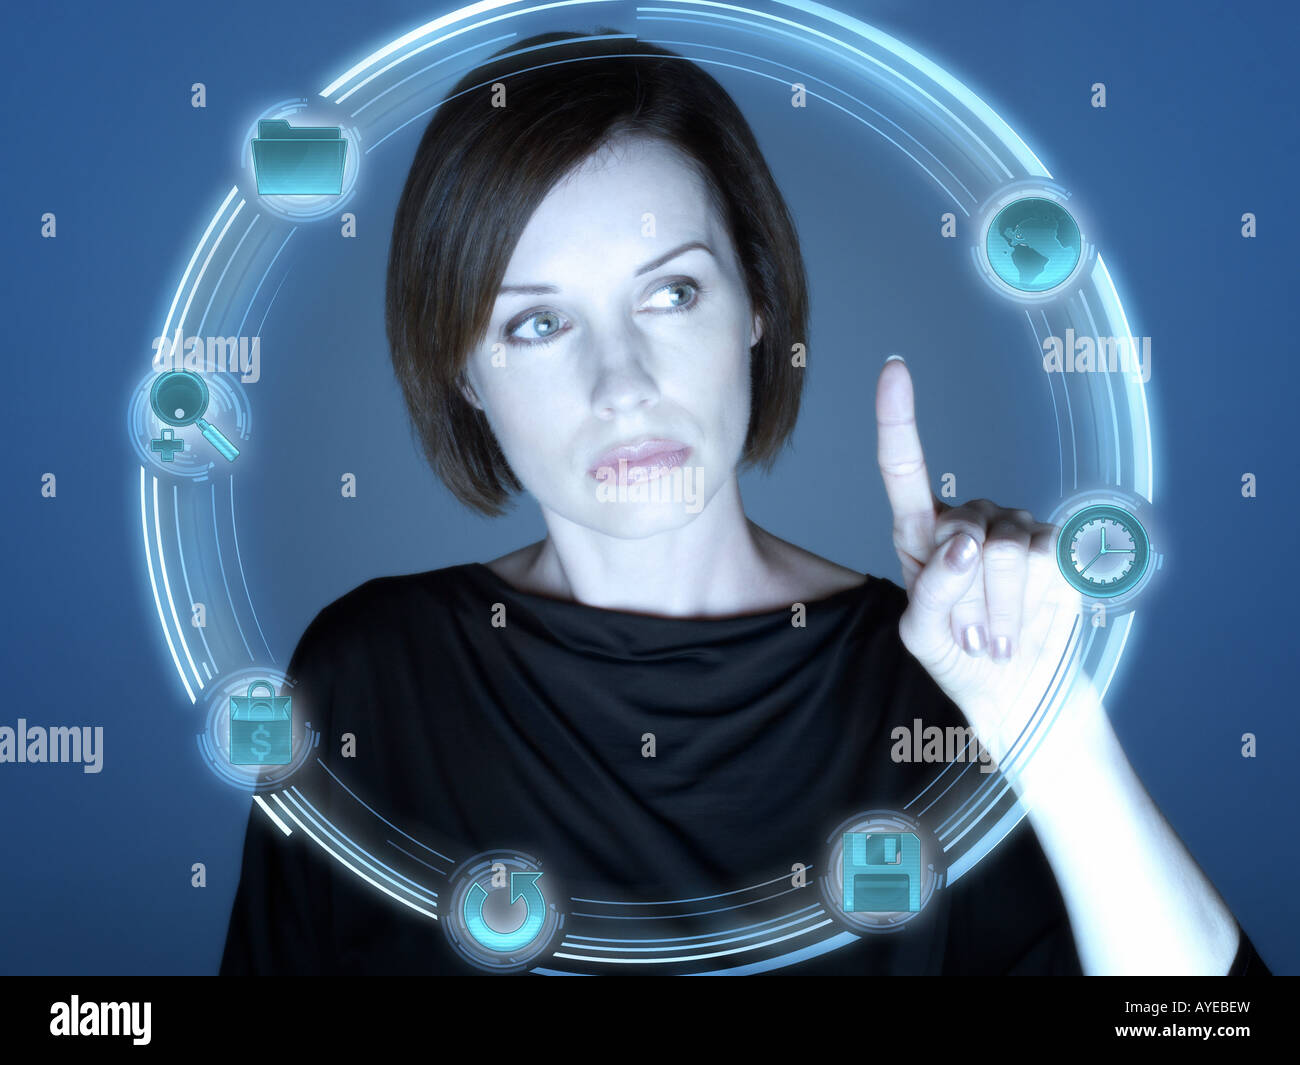 Frau und Computer-Symbole Stockbild